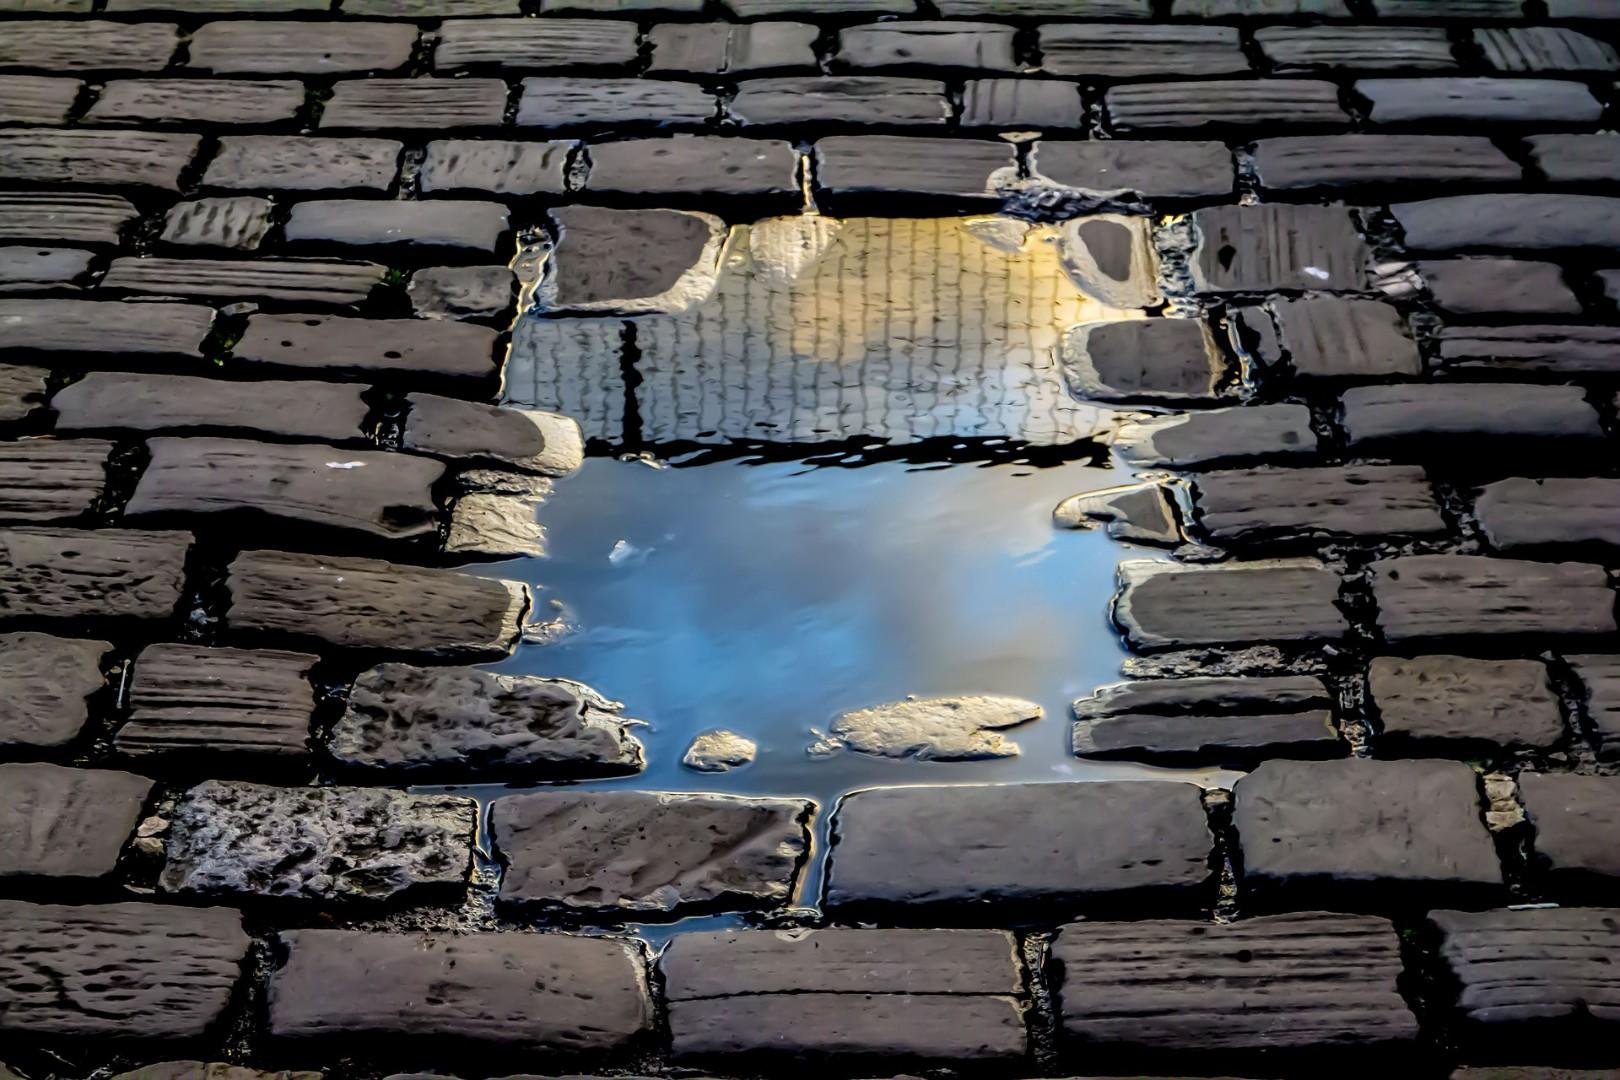 reflection-2922045_1920.jpg